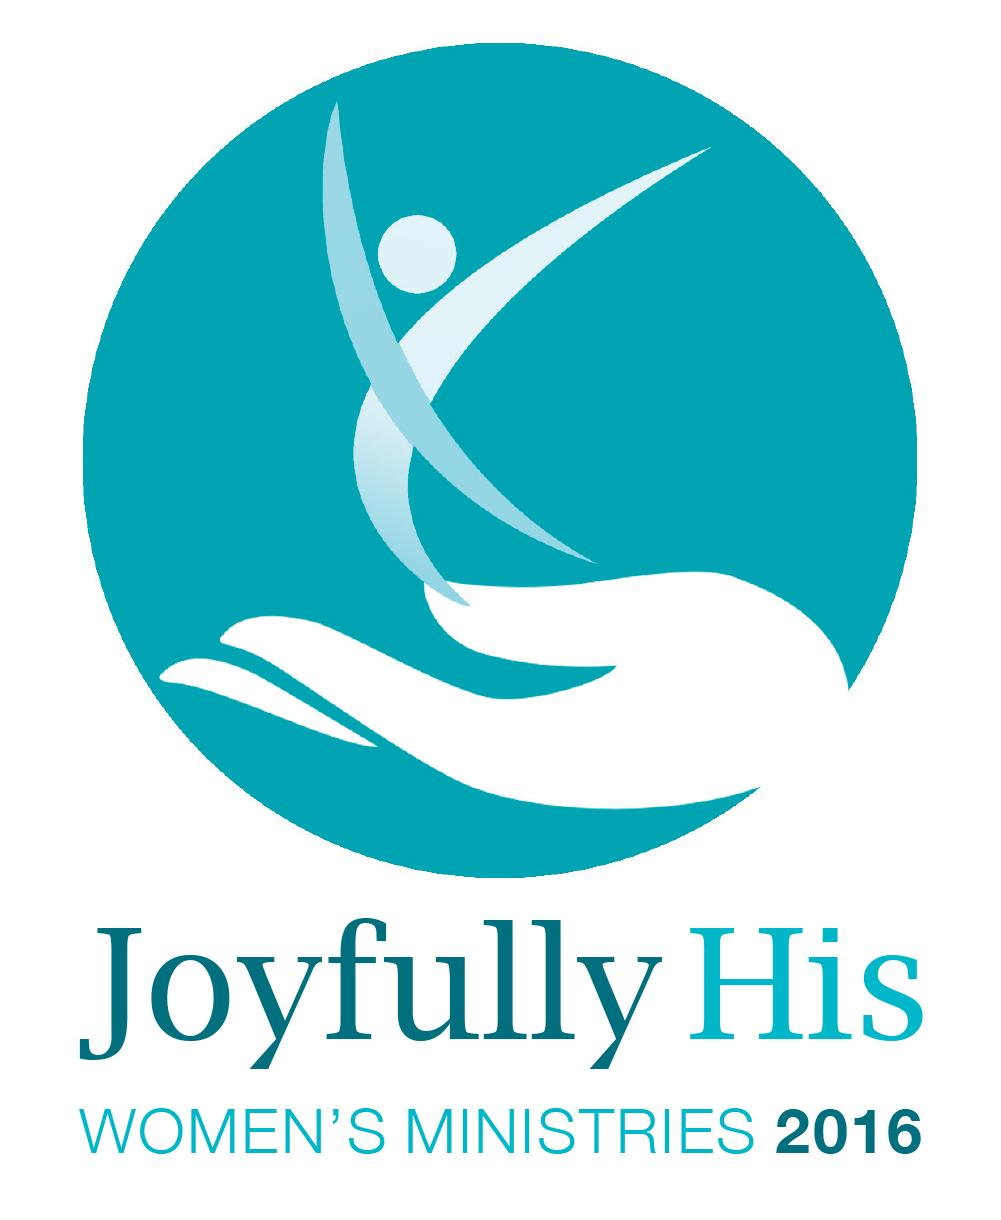 Joyfully His logo